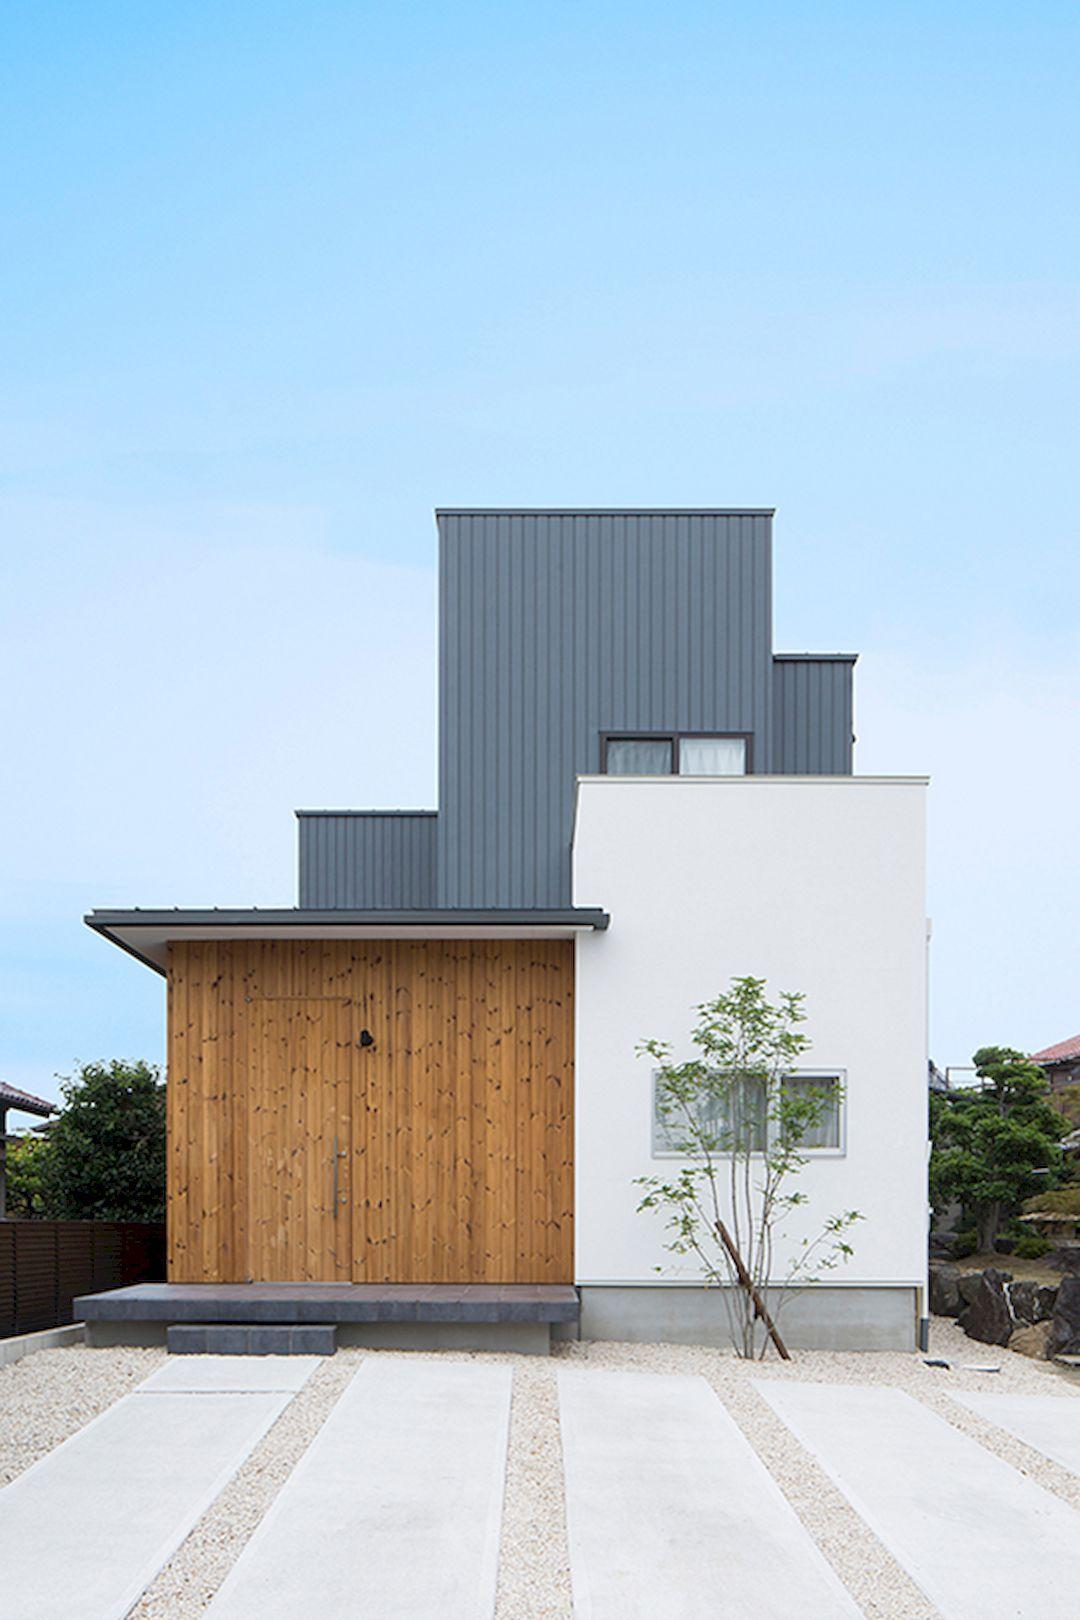 43 Outstanding Unique House Design Inspirations | Adazi | Pinterest on home decorating interior design, minimalist design living room, tv wall design, modern box house design,